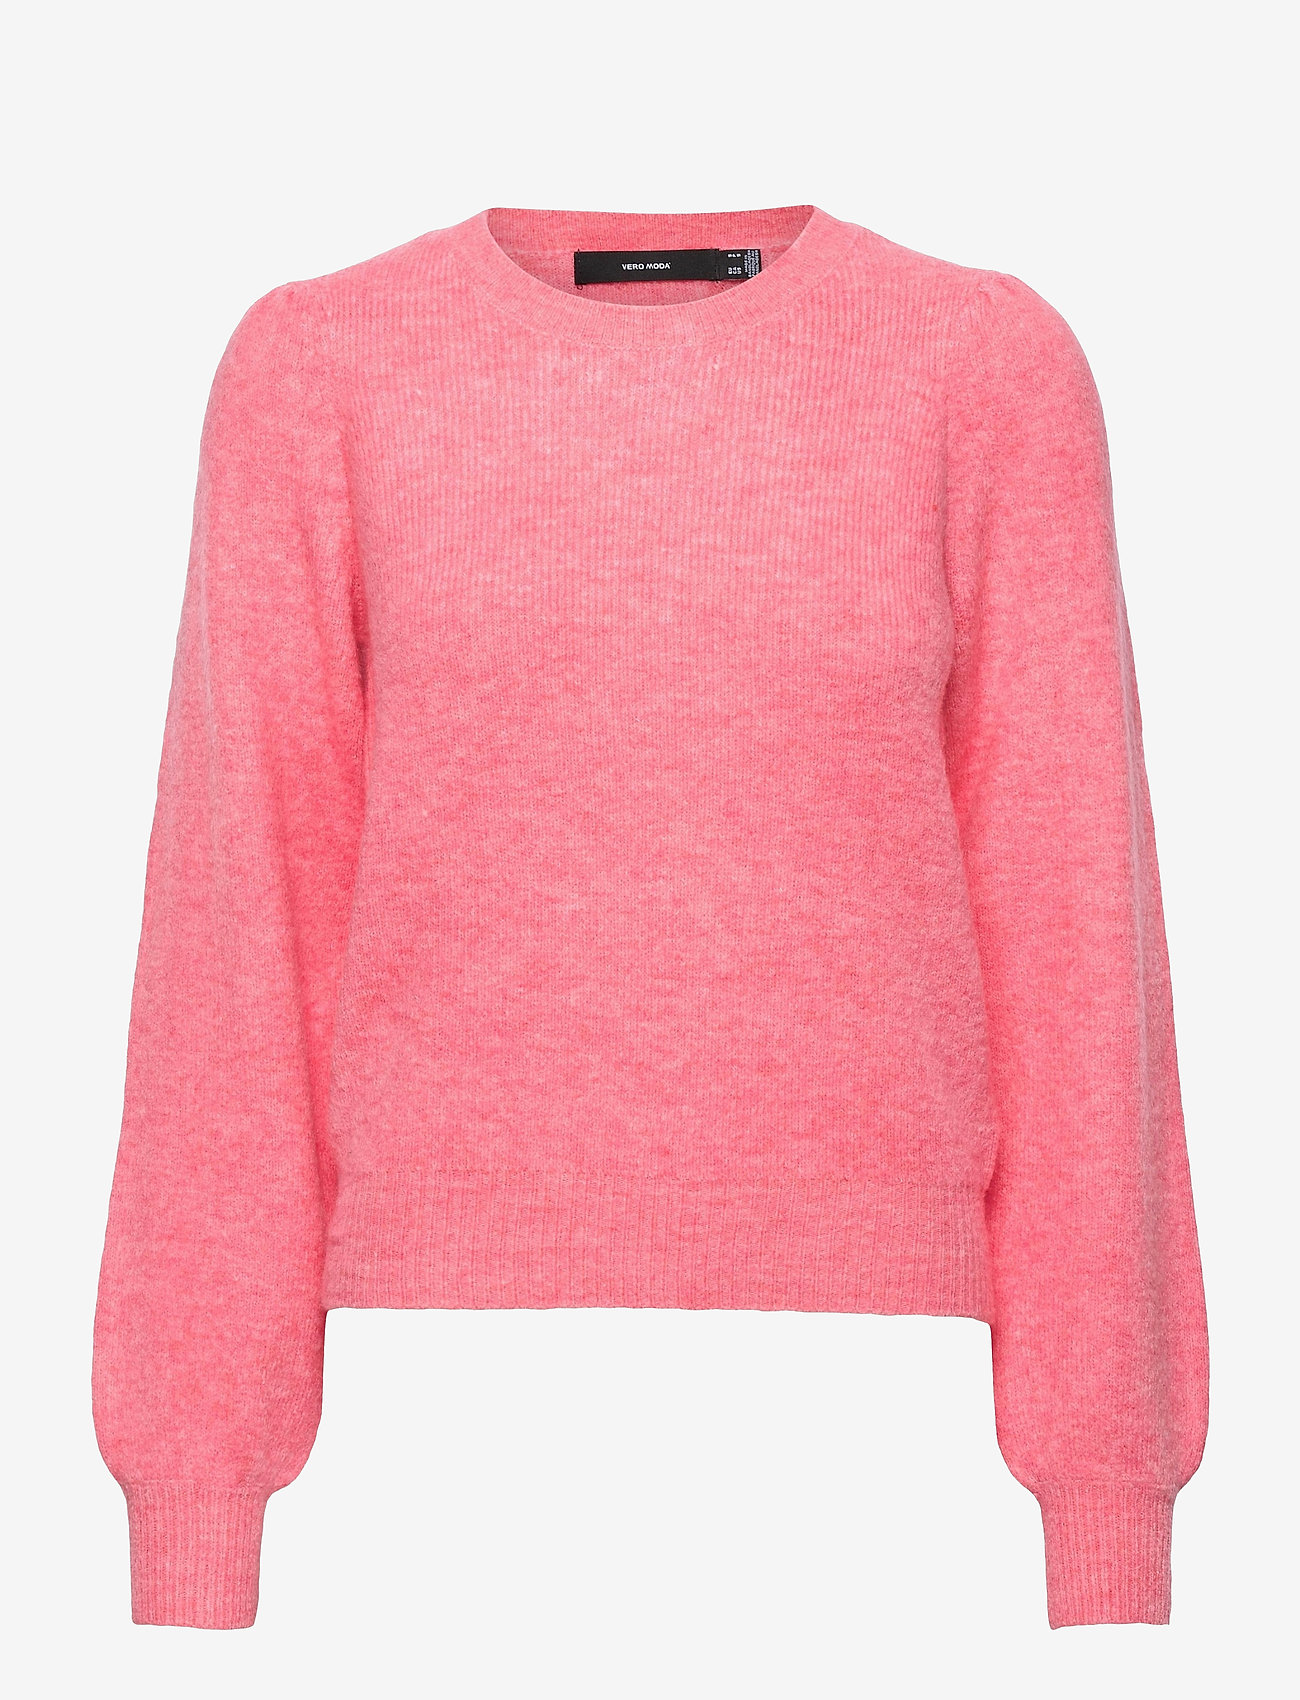 Vero Moda - VMLEFILE PUFF LS BLOUSE REP - tröjor - geranium pink - 0